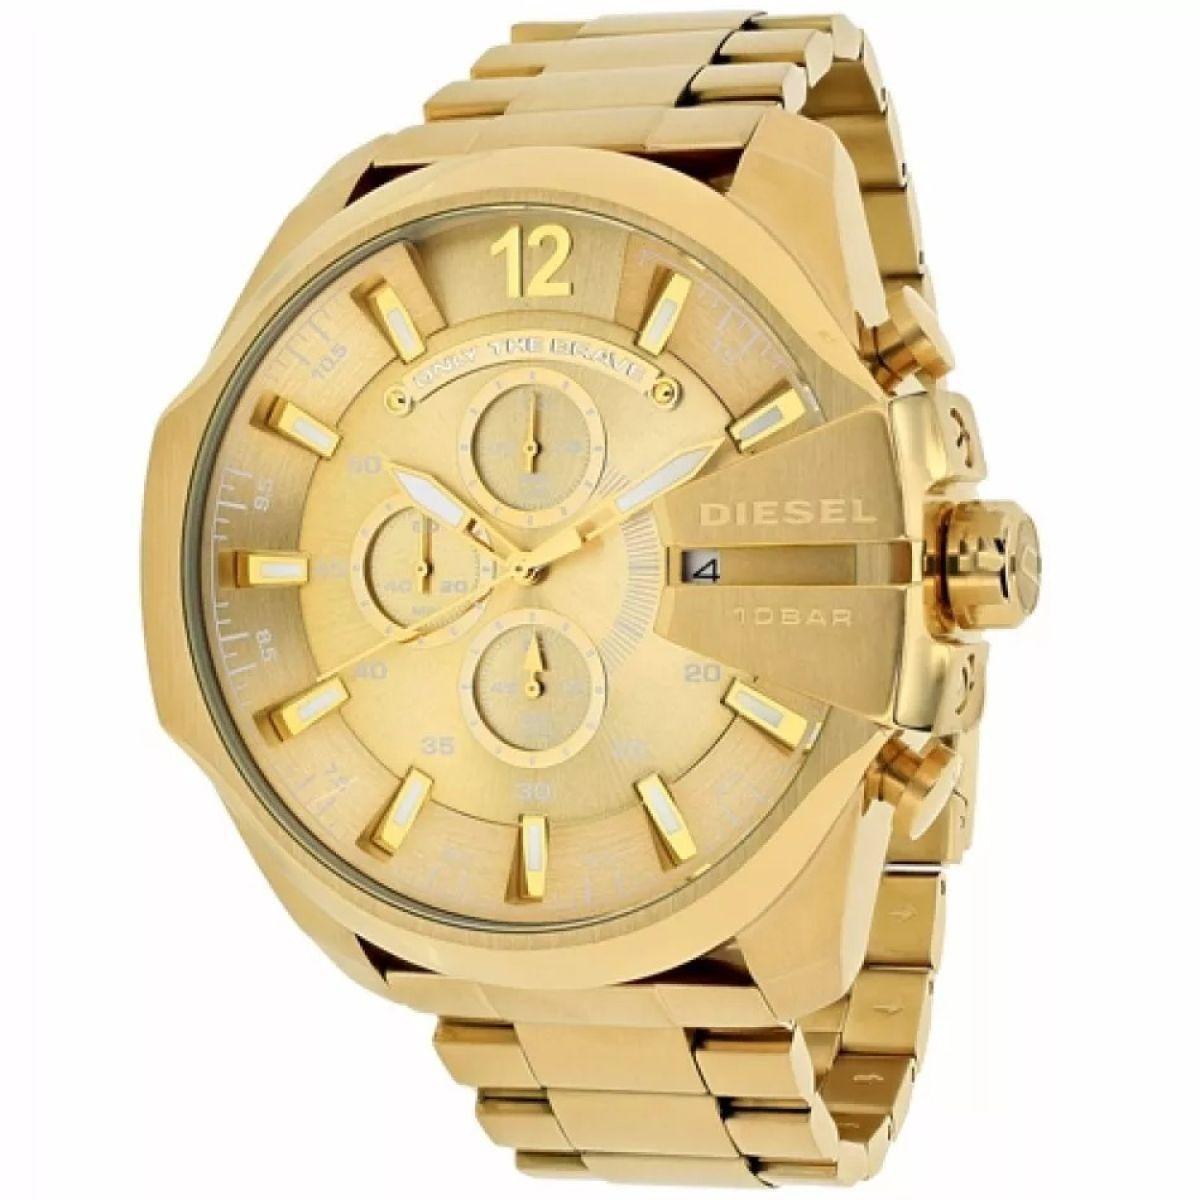 6eec003fad4 Relogio diesel masculino dourado dz4360 - Relógio Masculino ...